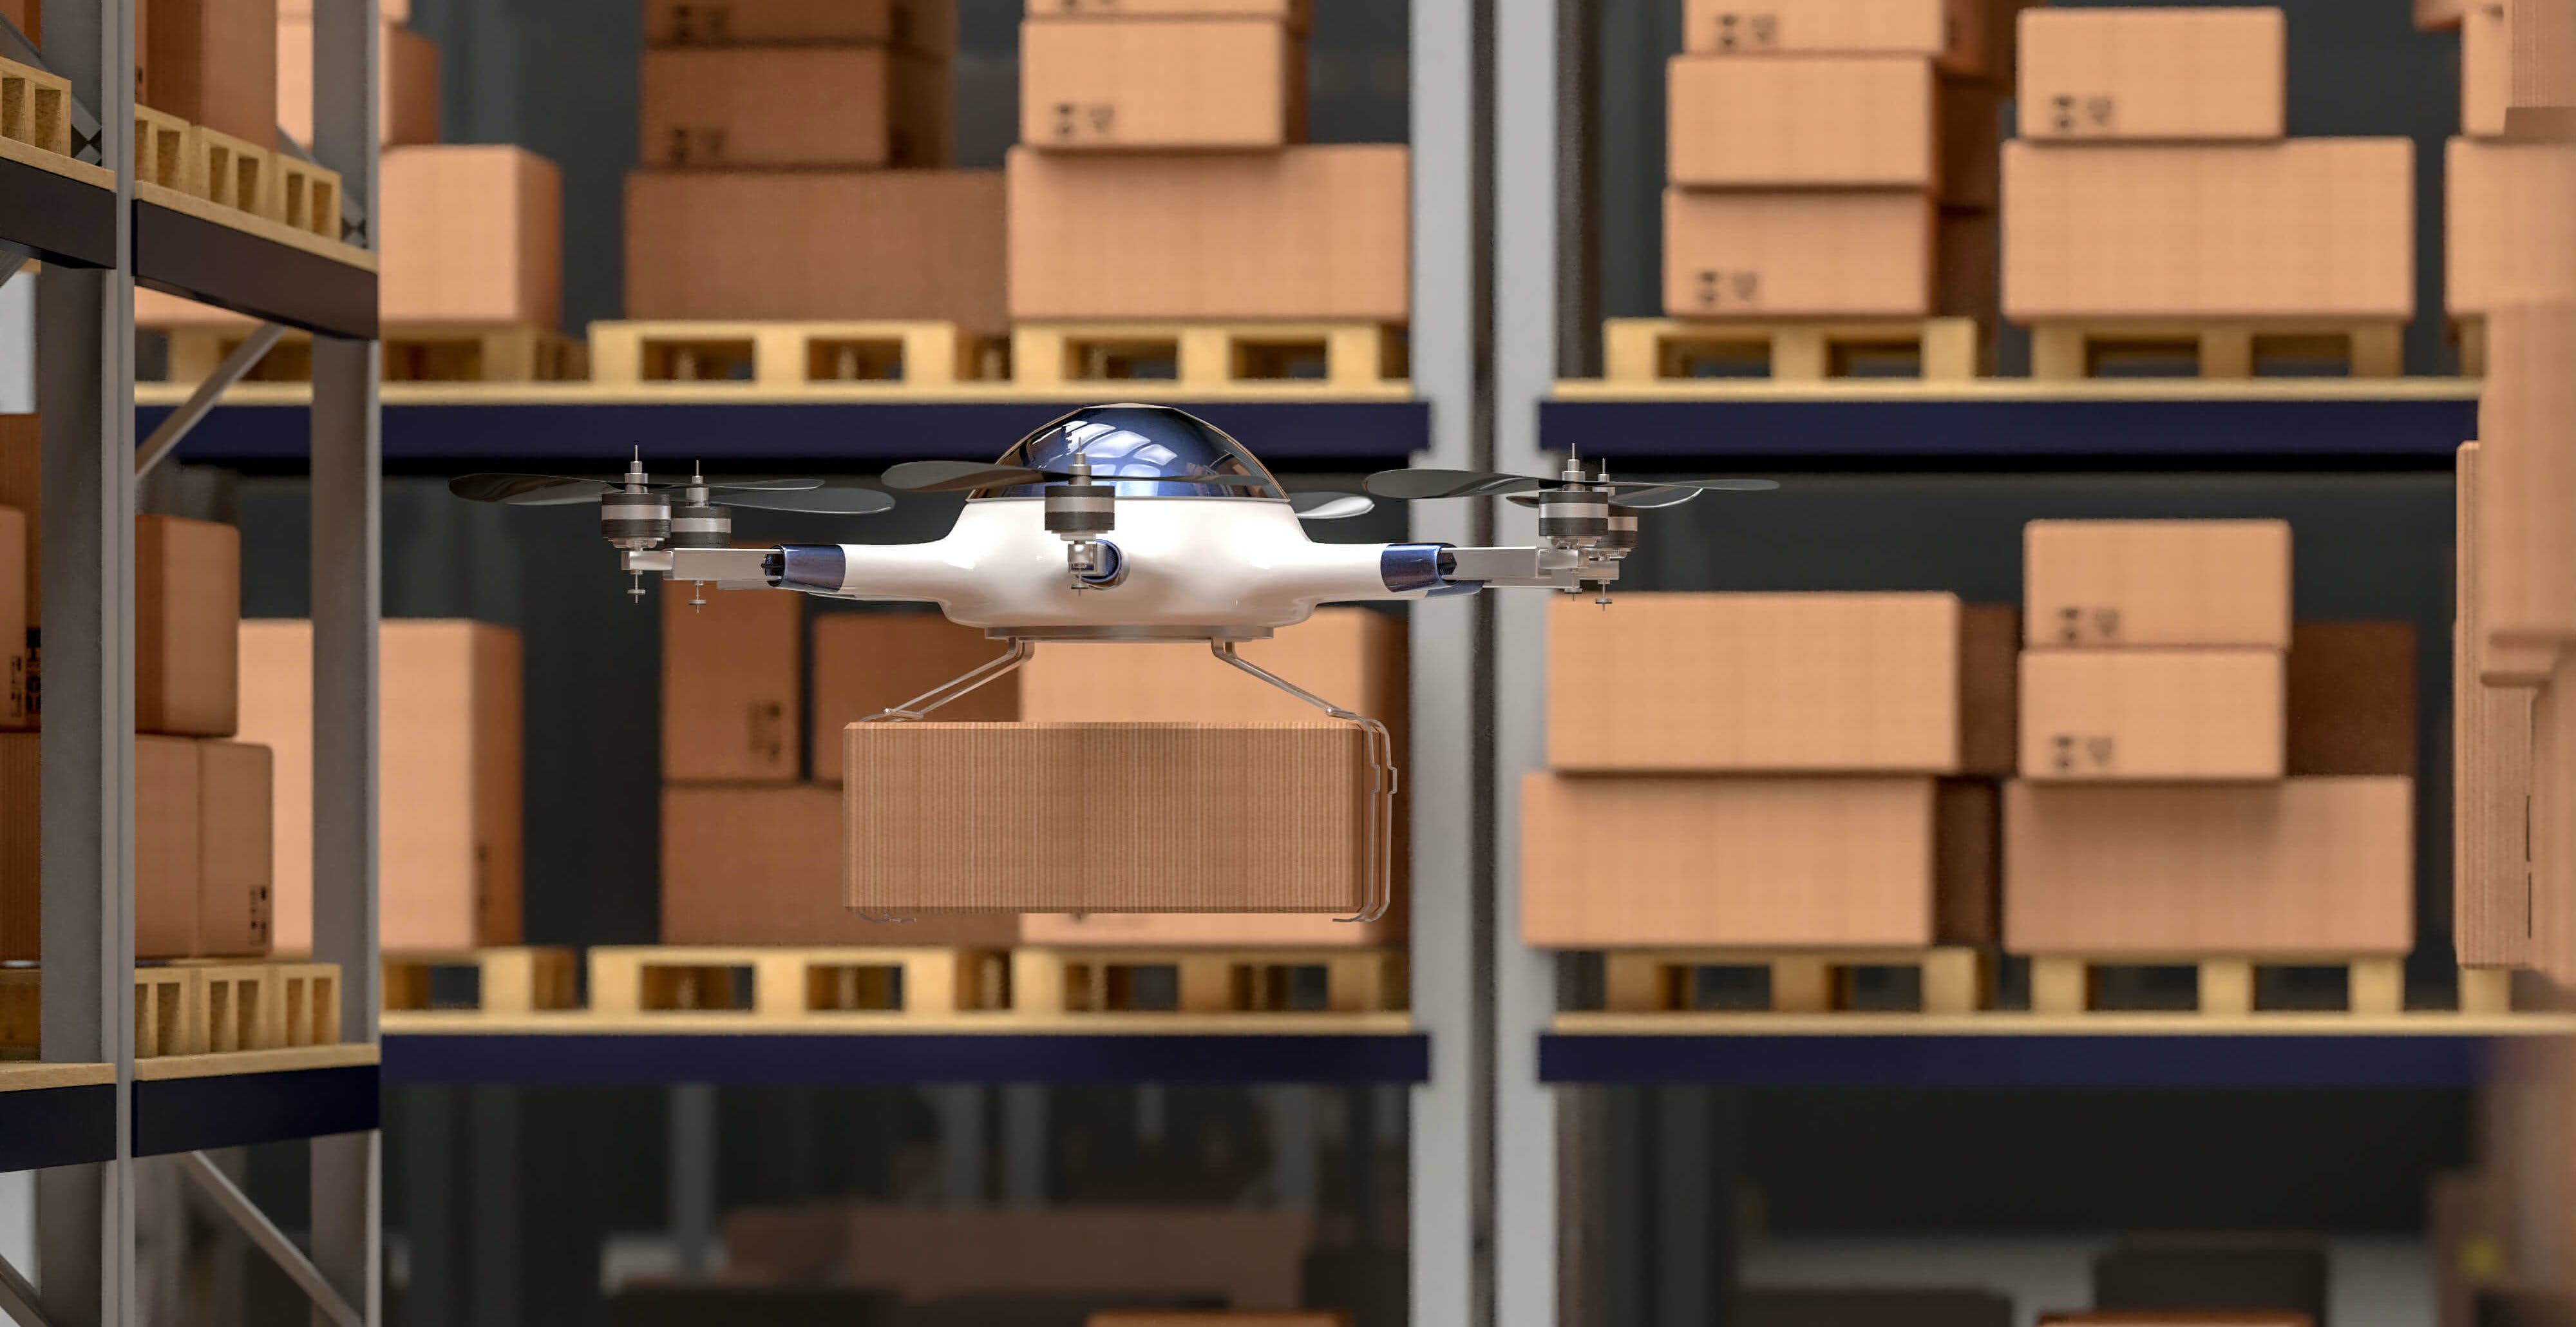 Titelbild-Drohne-Paket-Lager-Logistik-iStock-862621572